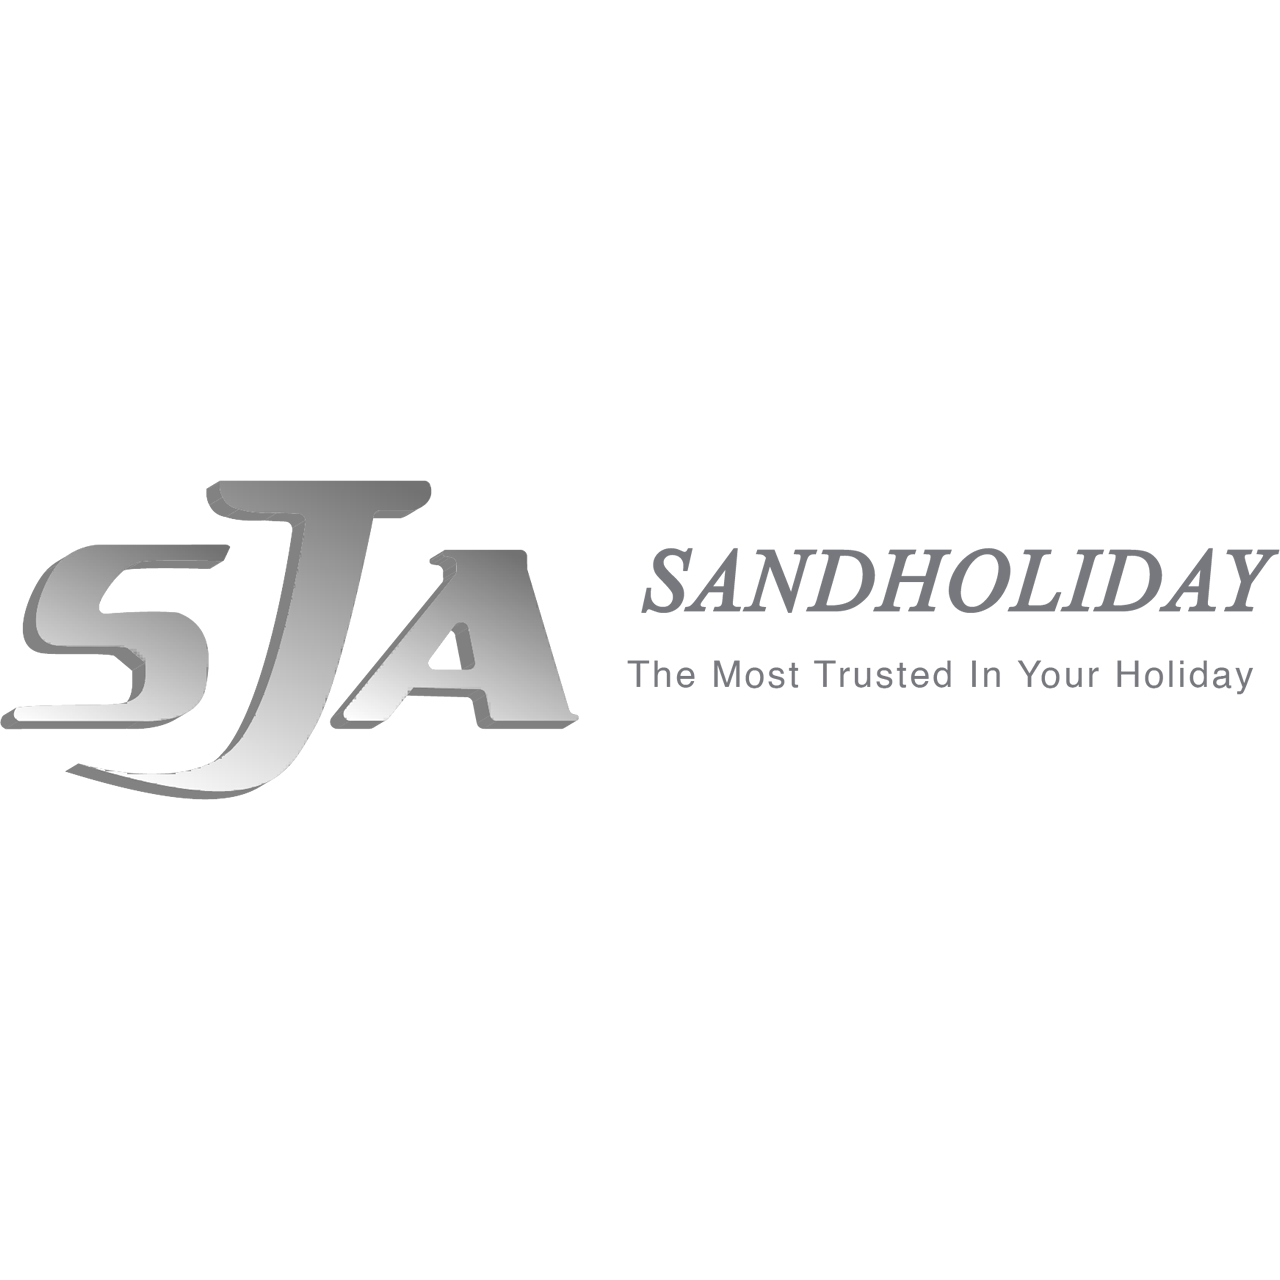 Sandholiday primary image